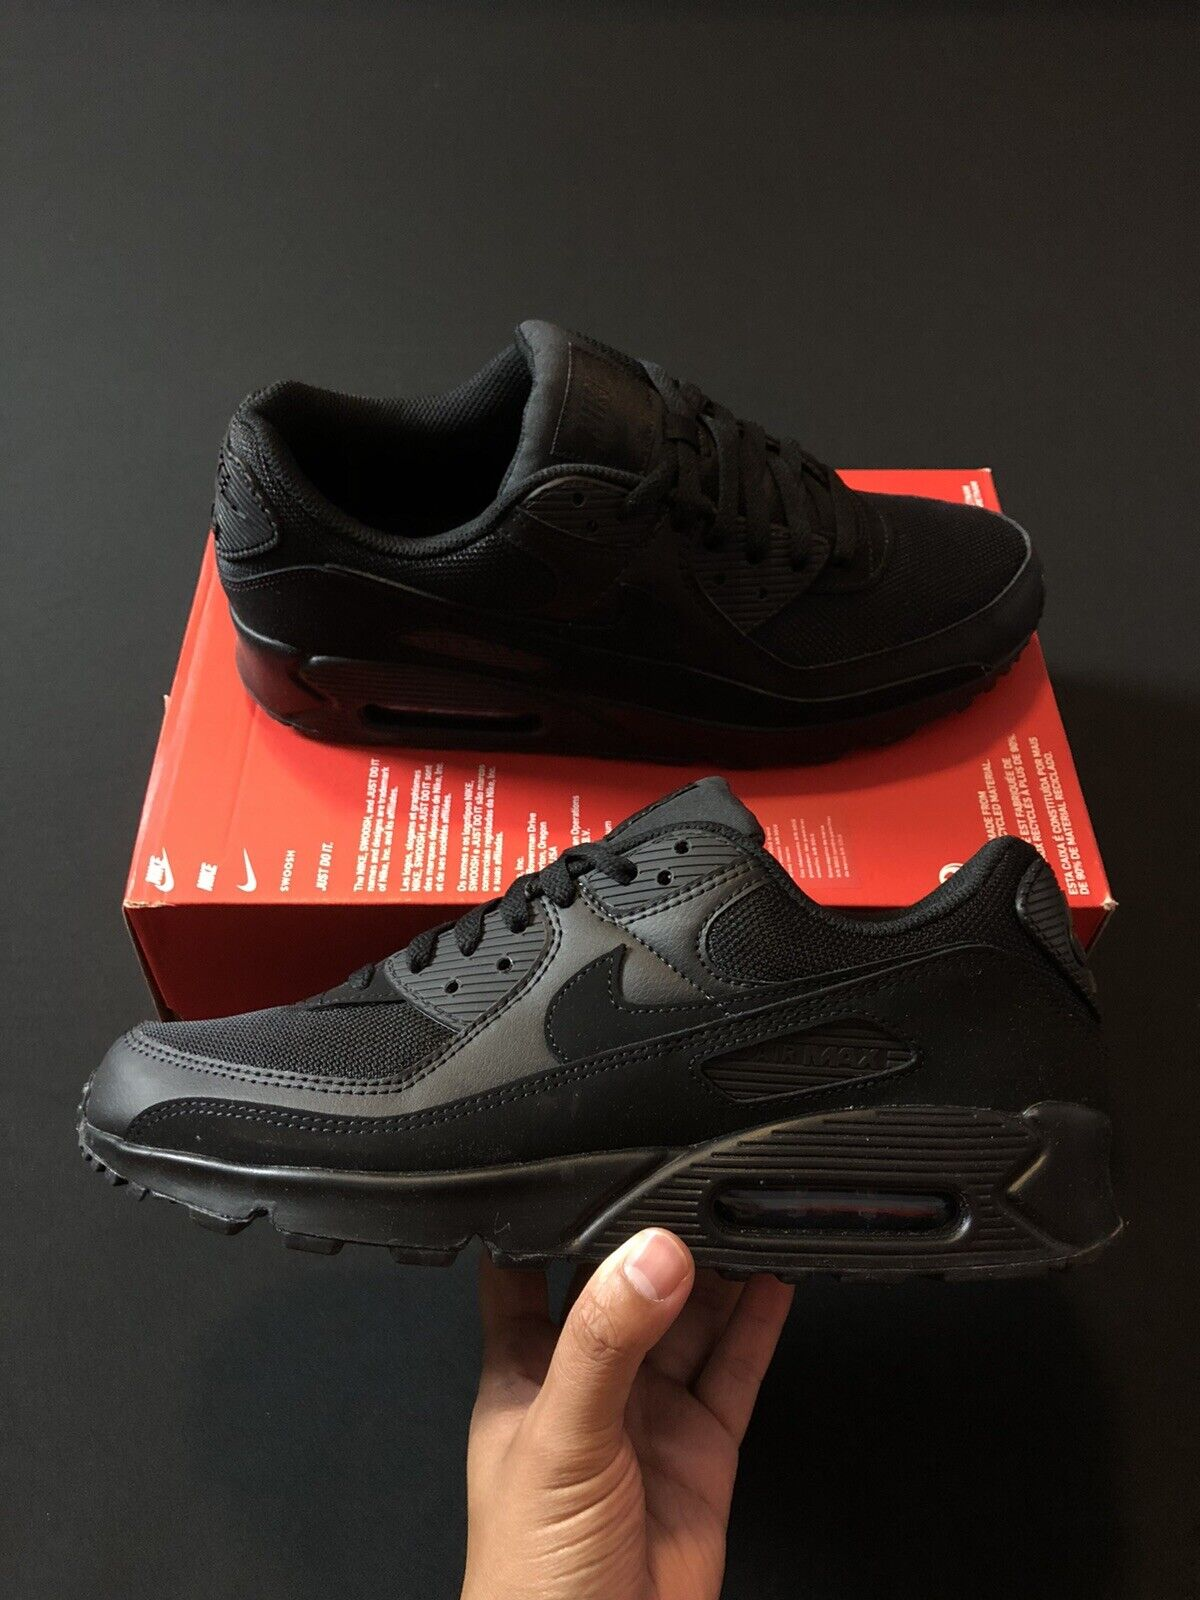 Size 12 - Nike Air Max 90 Triple Black 2020